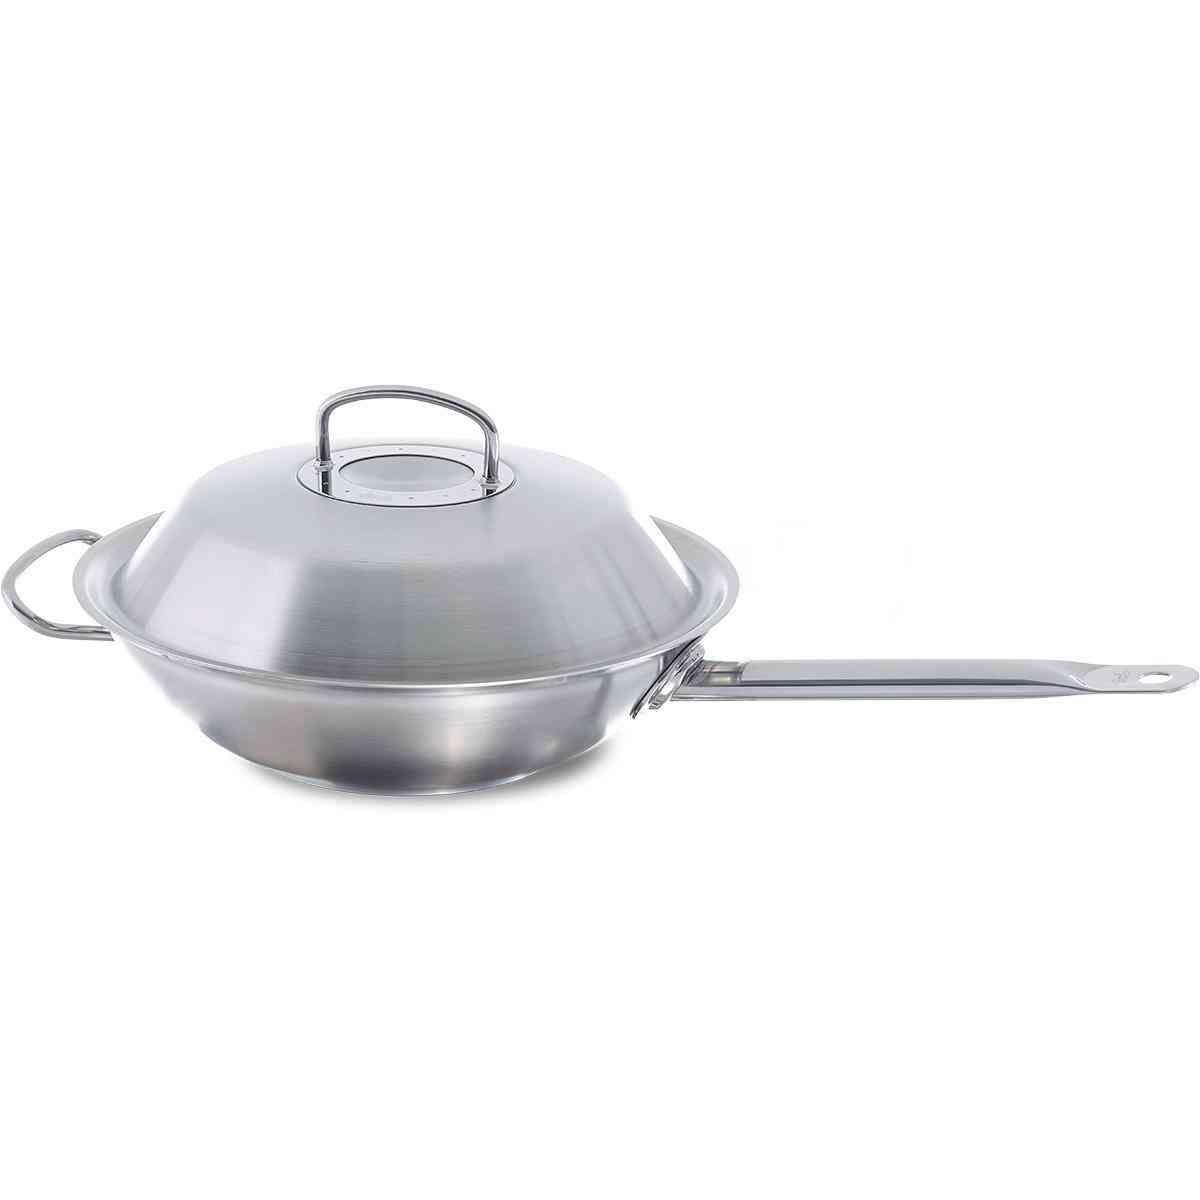 original-profi collection handle-wok 30 cm